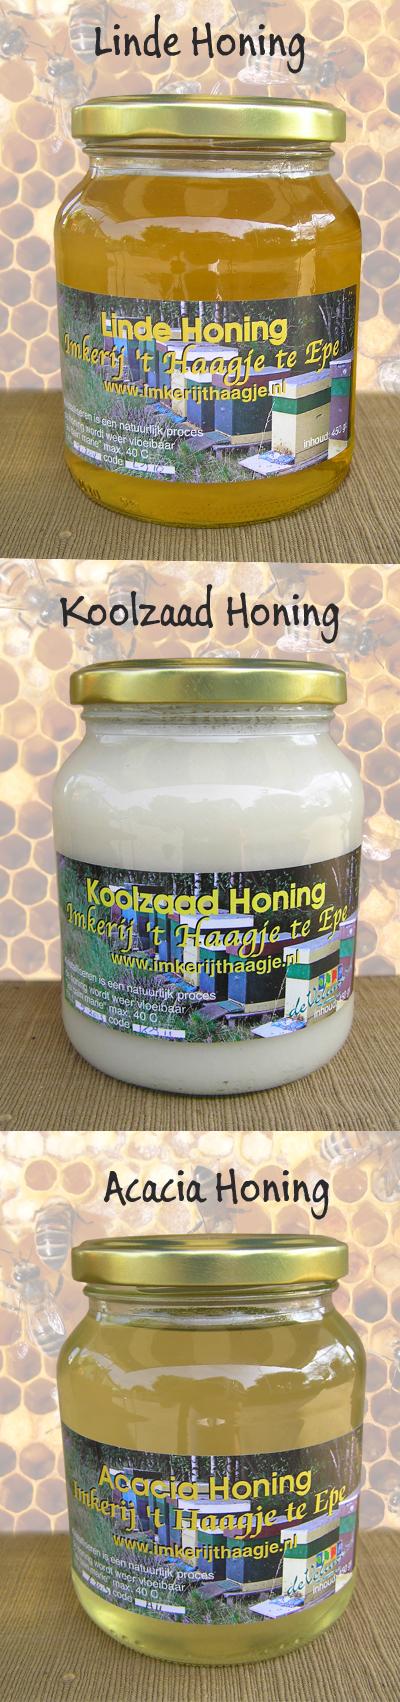 Honing Jpeg sidebar